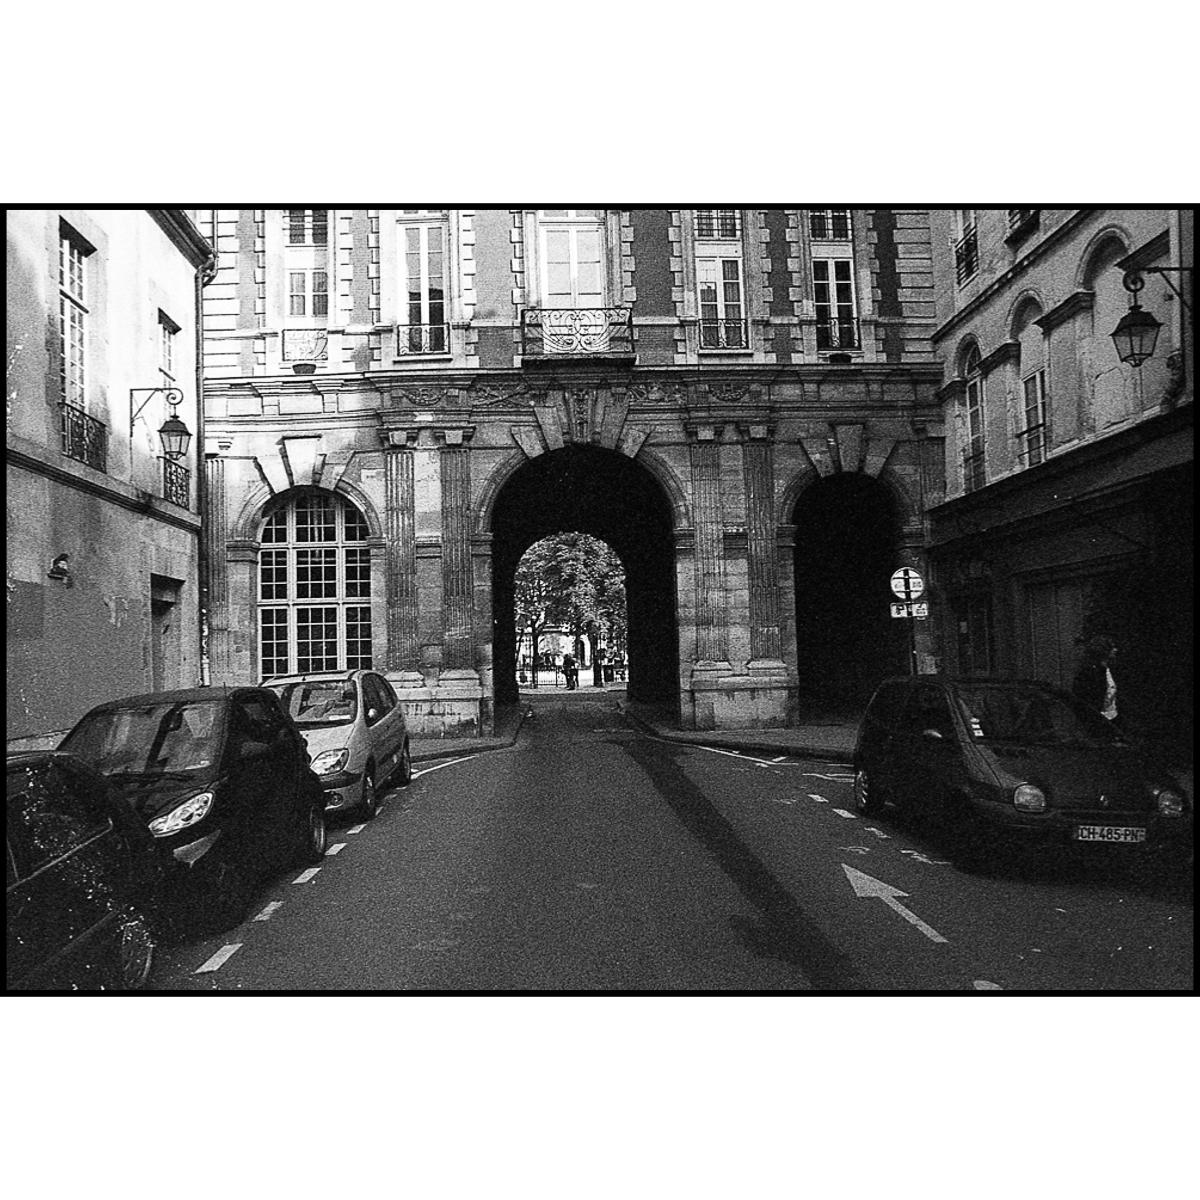 paris file-080.jpg